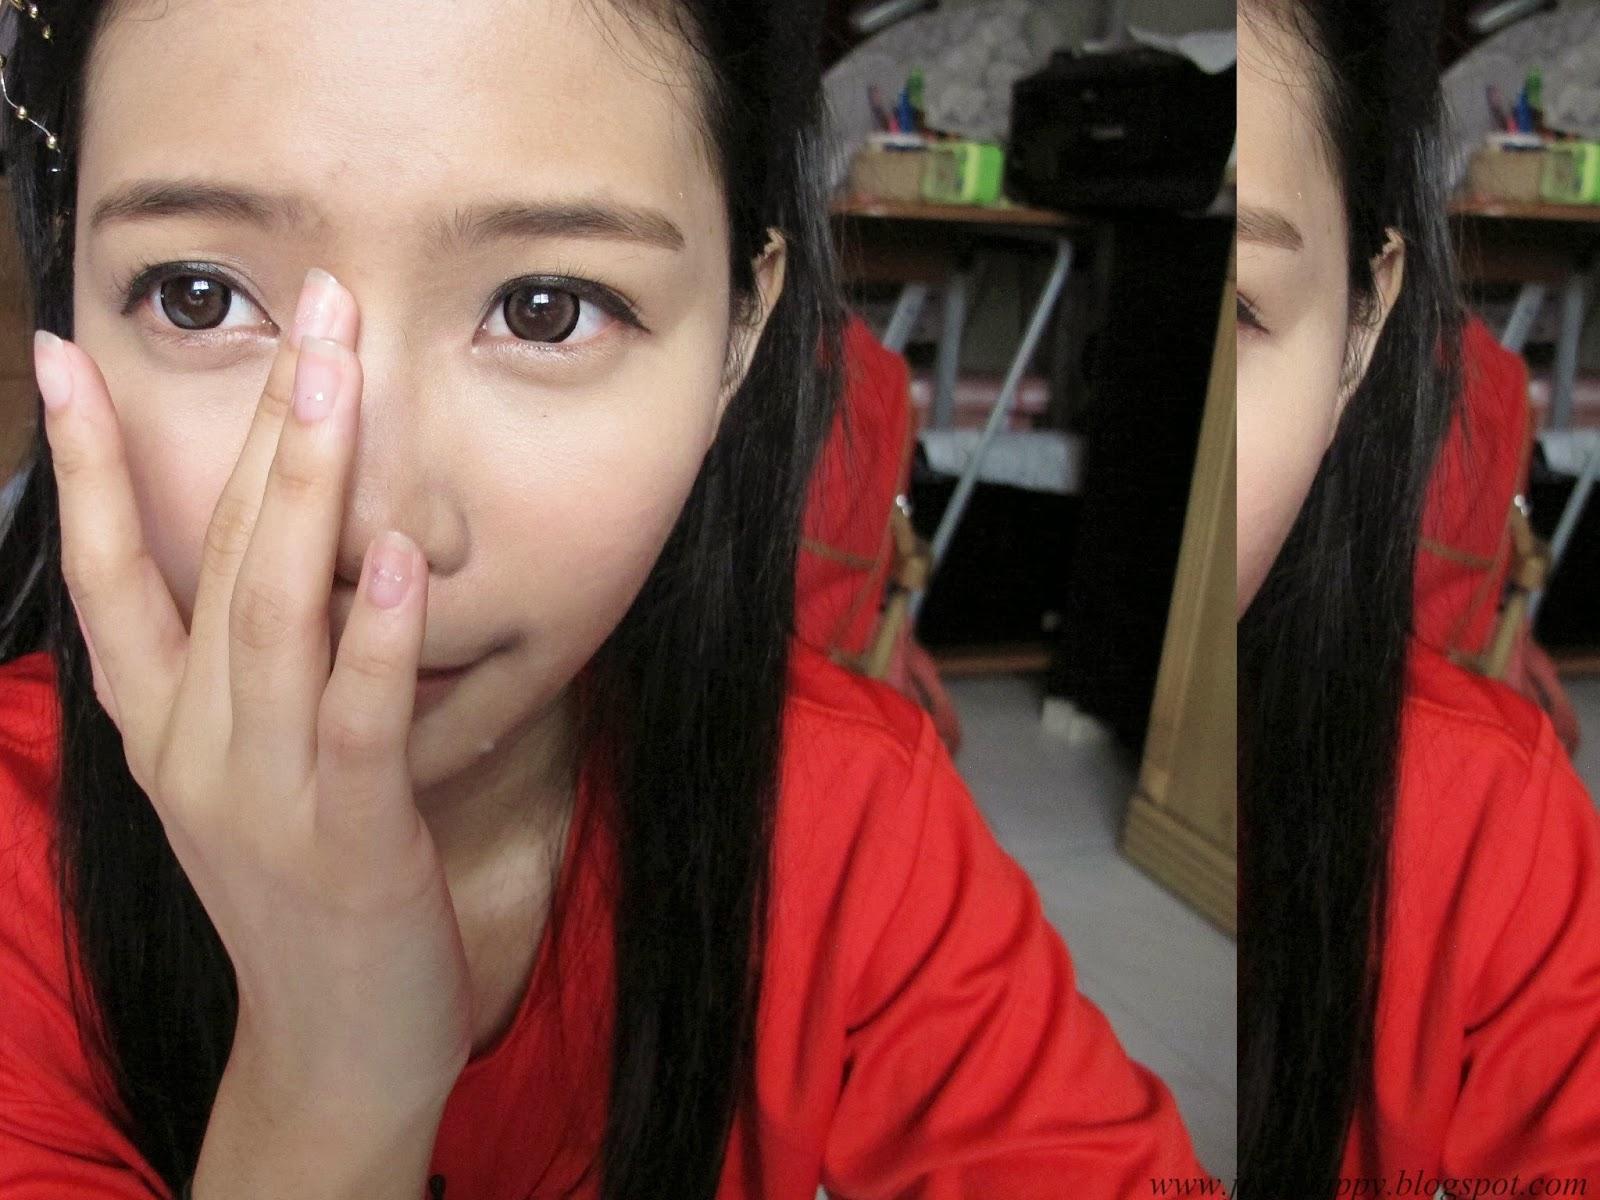 eyeshadow powder as a nose contour powder